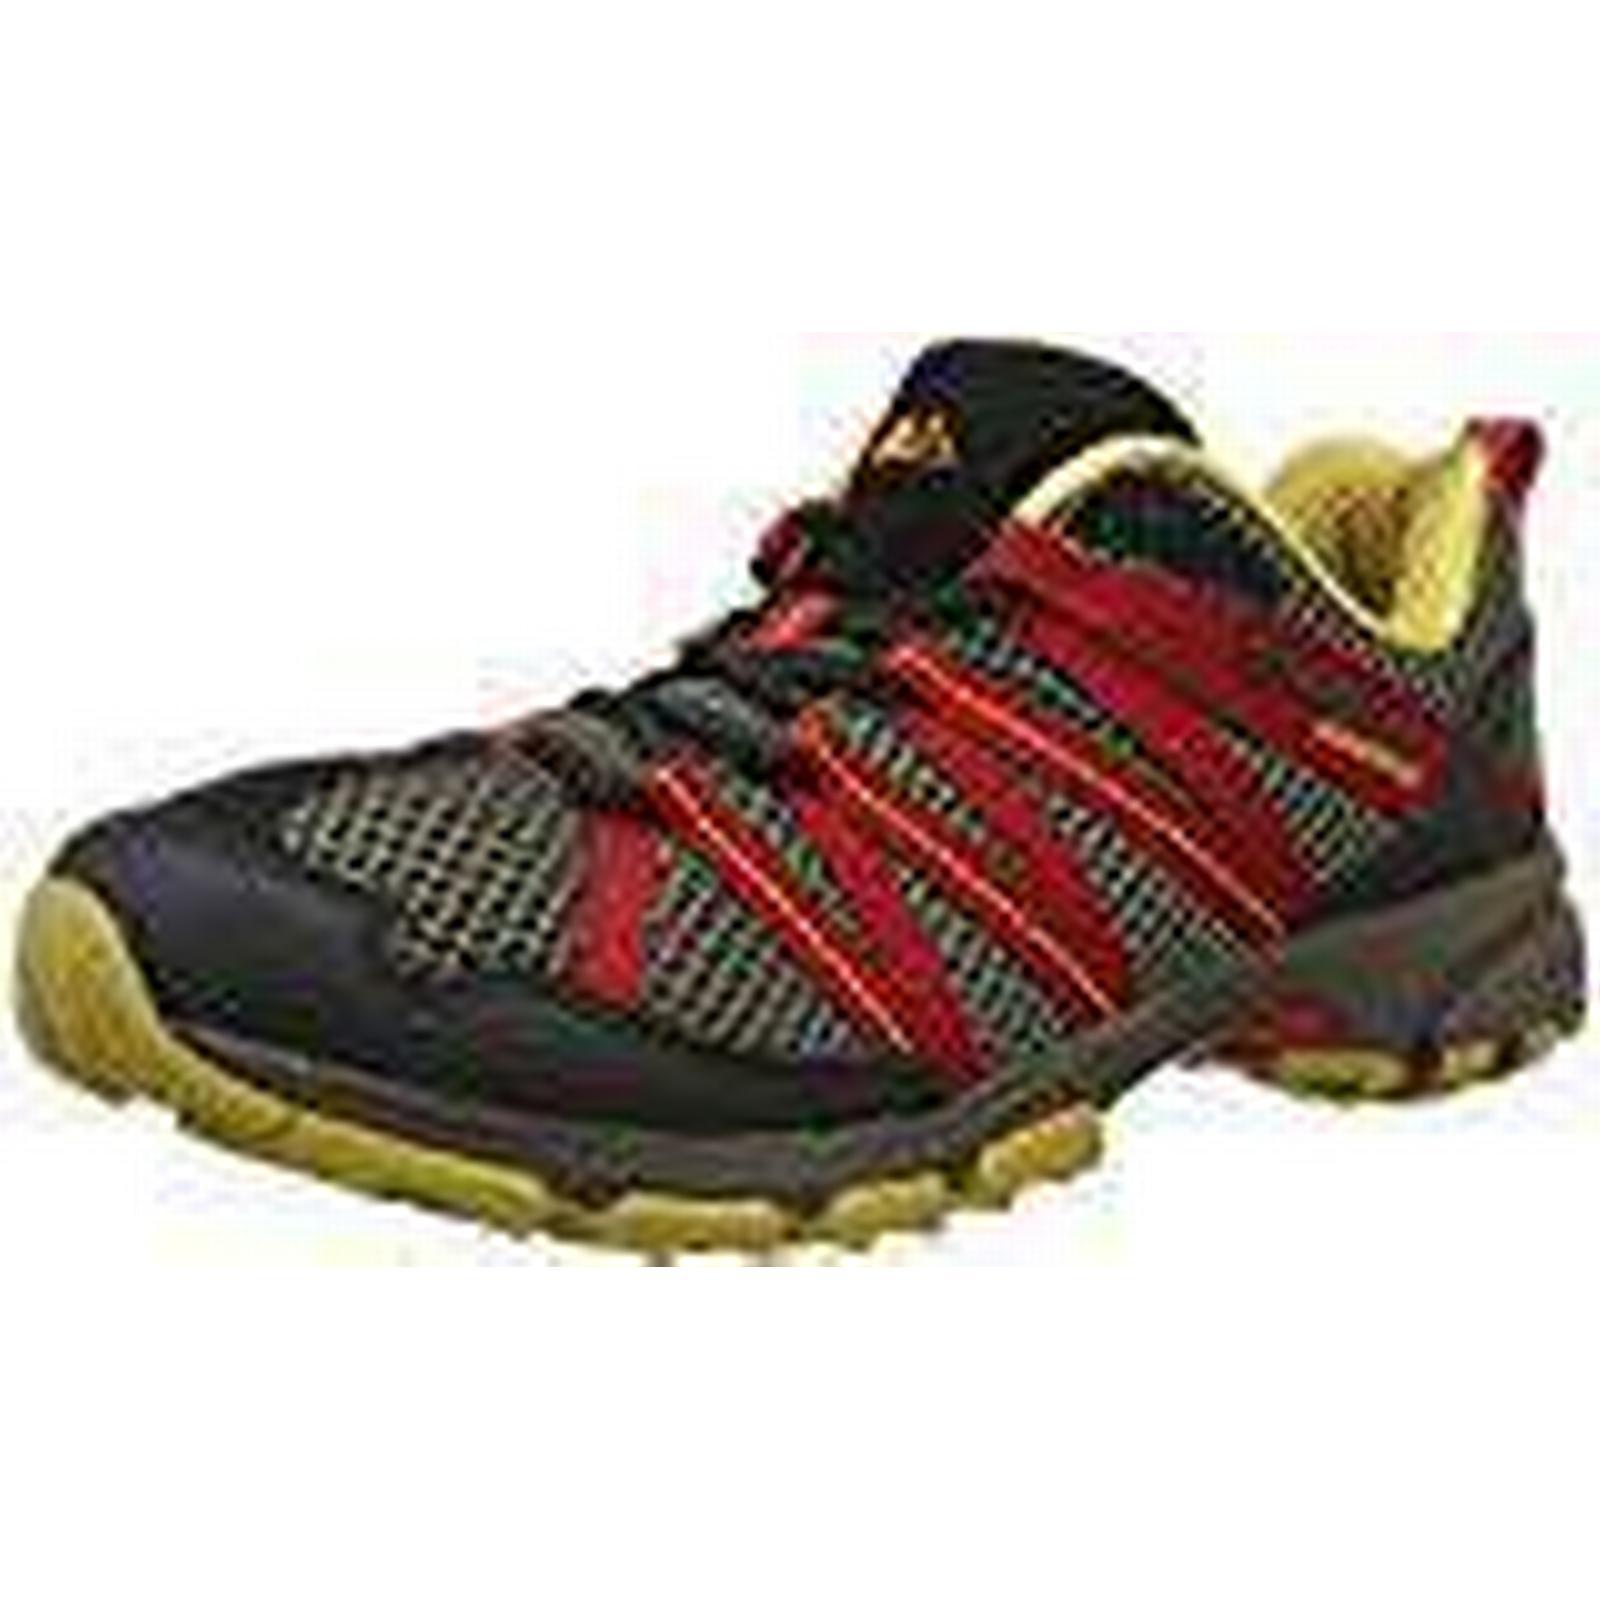 Columbia Men's Mountain Masochist Iii Trail 14 Running Shoes, Red (Mud/Rocket), 14 Trail UK 48 EU 30cb72